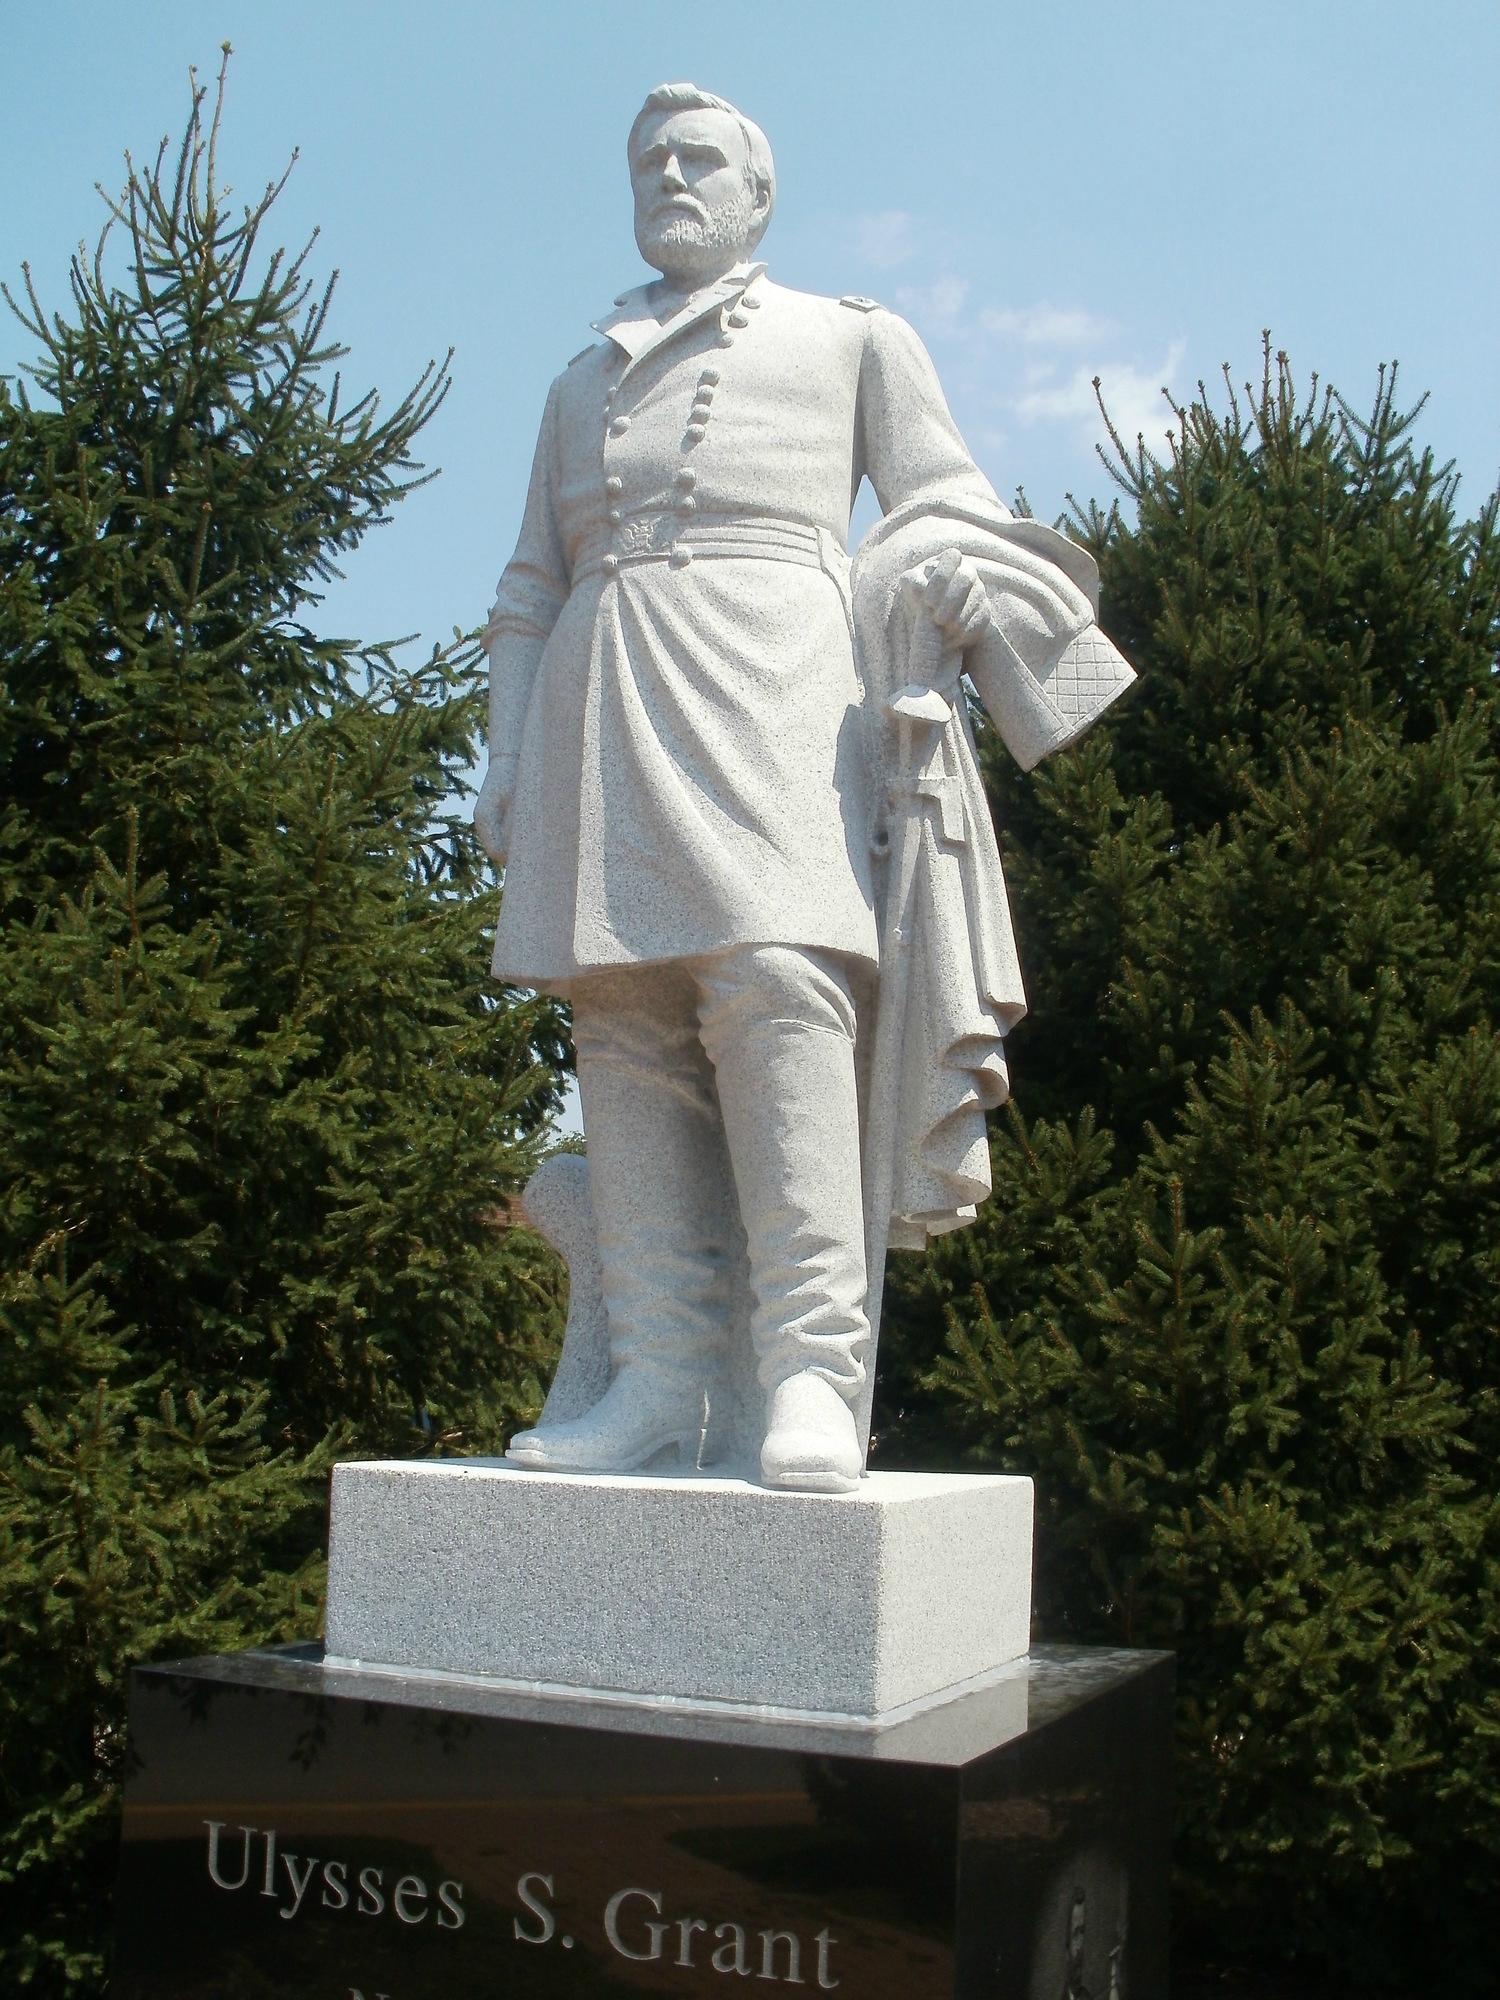 Grant+Statue+Alone+#1.png